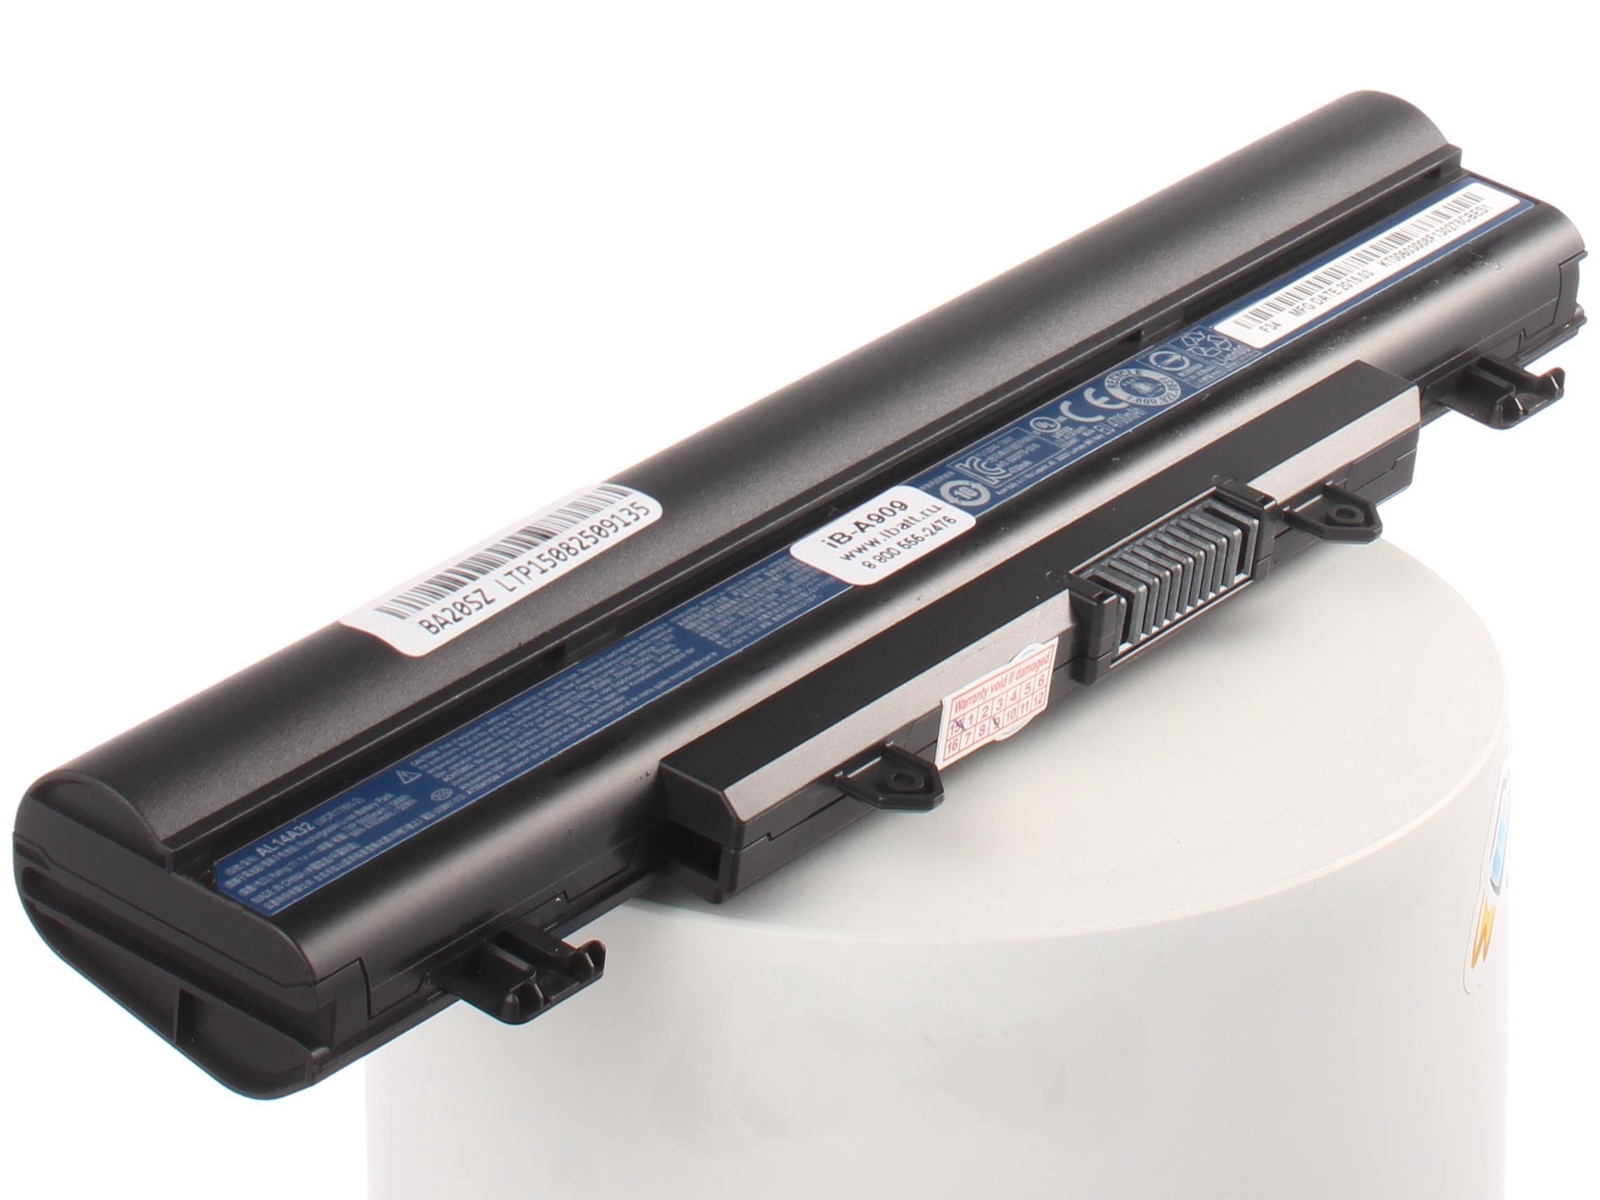 Аккумулятор для ноутбука iBatt для Acer ASPIRE E5-551G-T25W, Aspire E5-571G-56MQ, TravelMate P276, Aspire V3-572G-50WM, Aspire E5-531G-P859, ASPIRE E5-571-34H8, ASPIRE E5-511-P4Y7, Aspire E5-551G-85XR, Extensa EX2510 acer aspire e5 573 331j